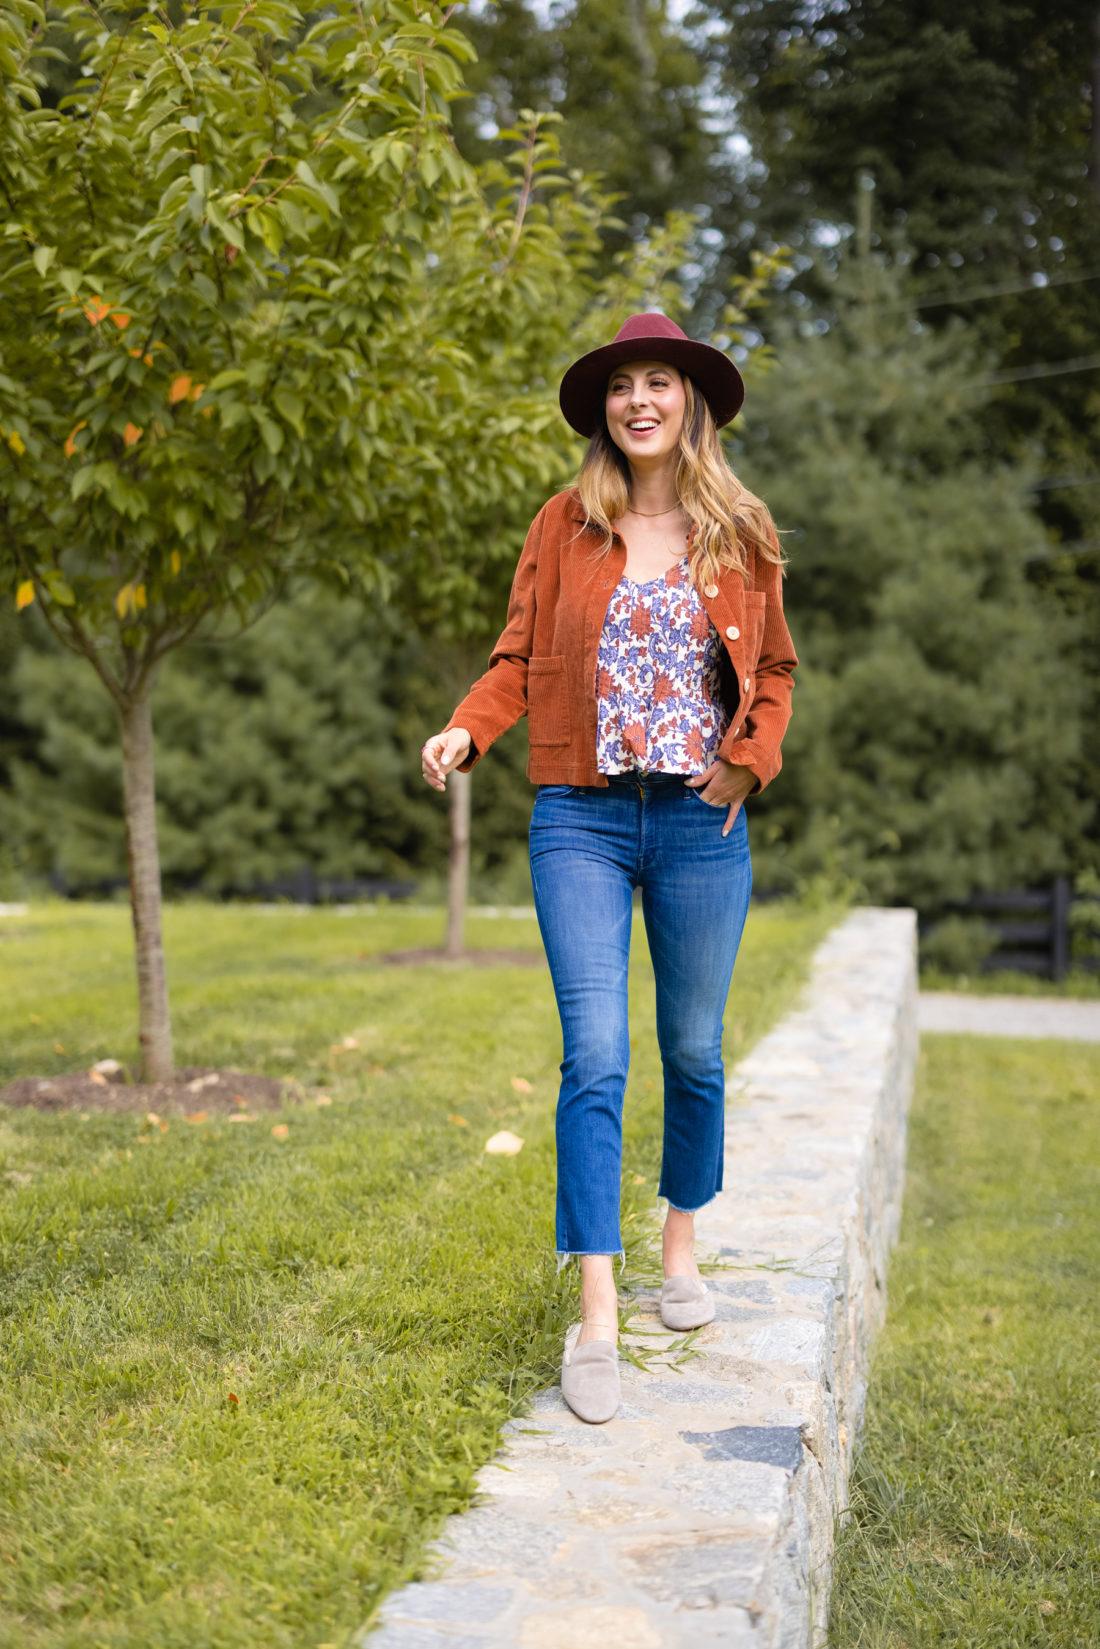 Eva Amurri shares some of her favorite Connecticut Small Businesses